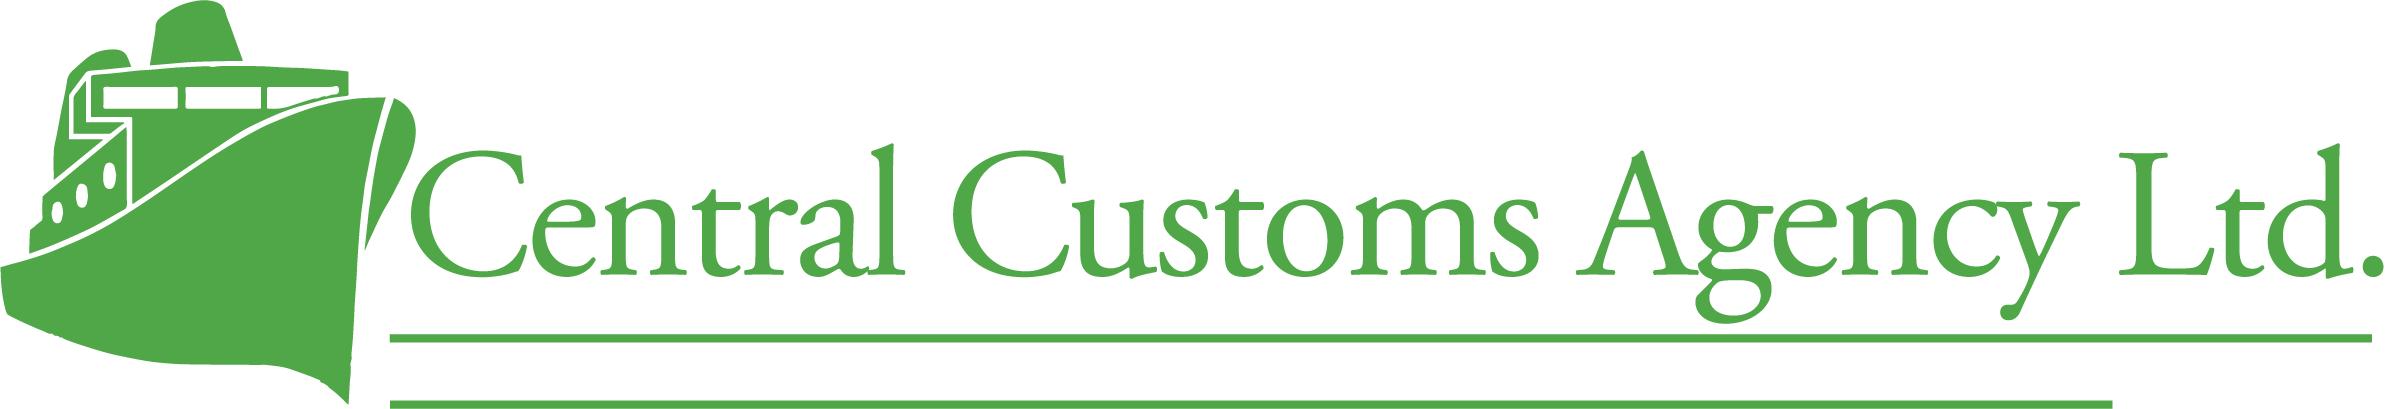 Central Customs Agency Ltd logo.